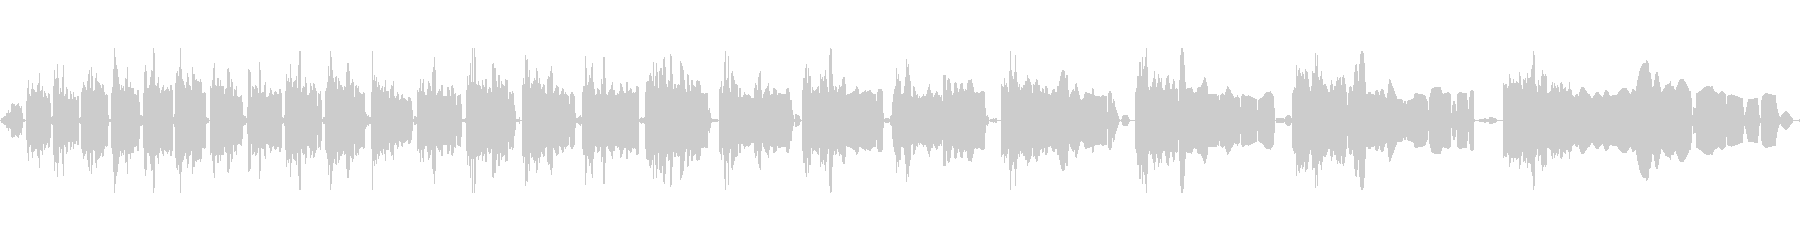 SynthSwipe EC06_55_2の未再生の波形